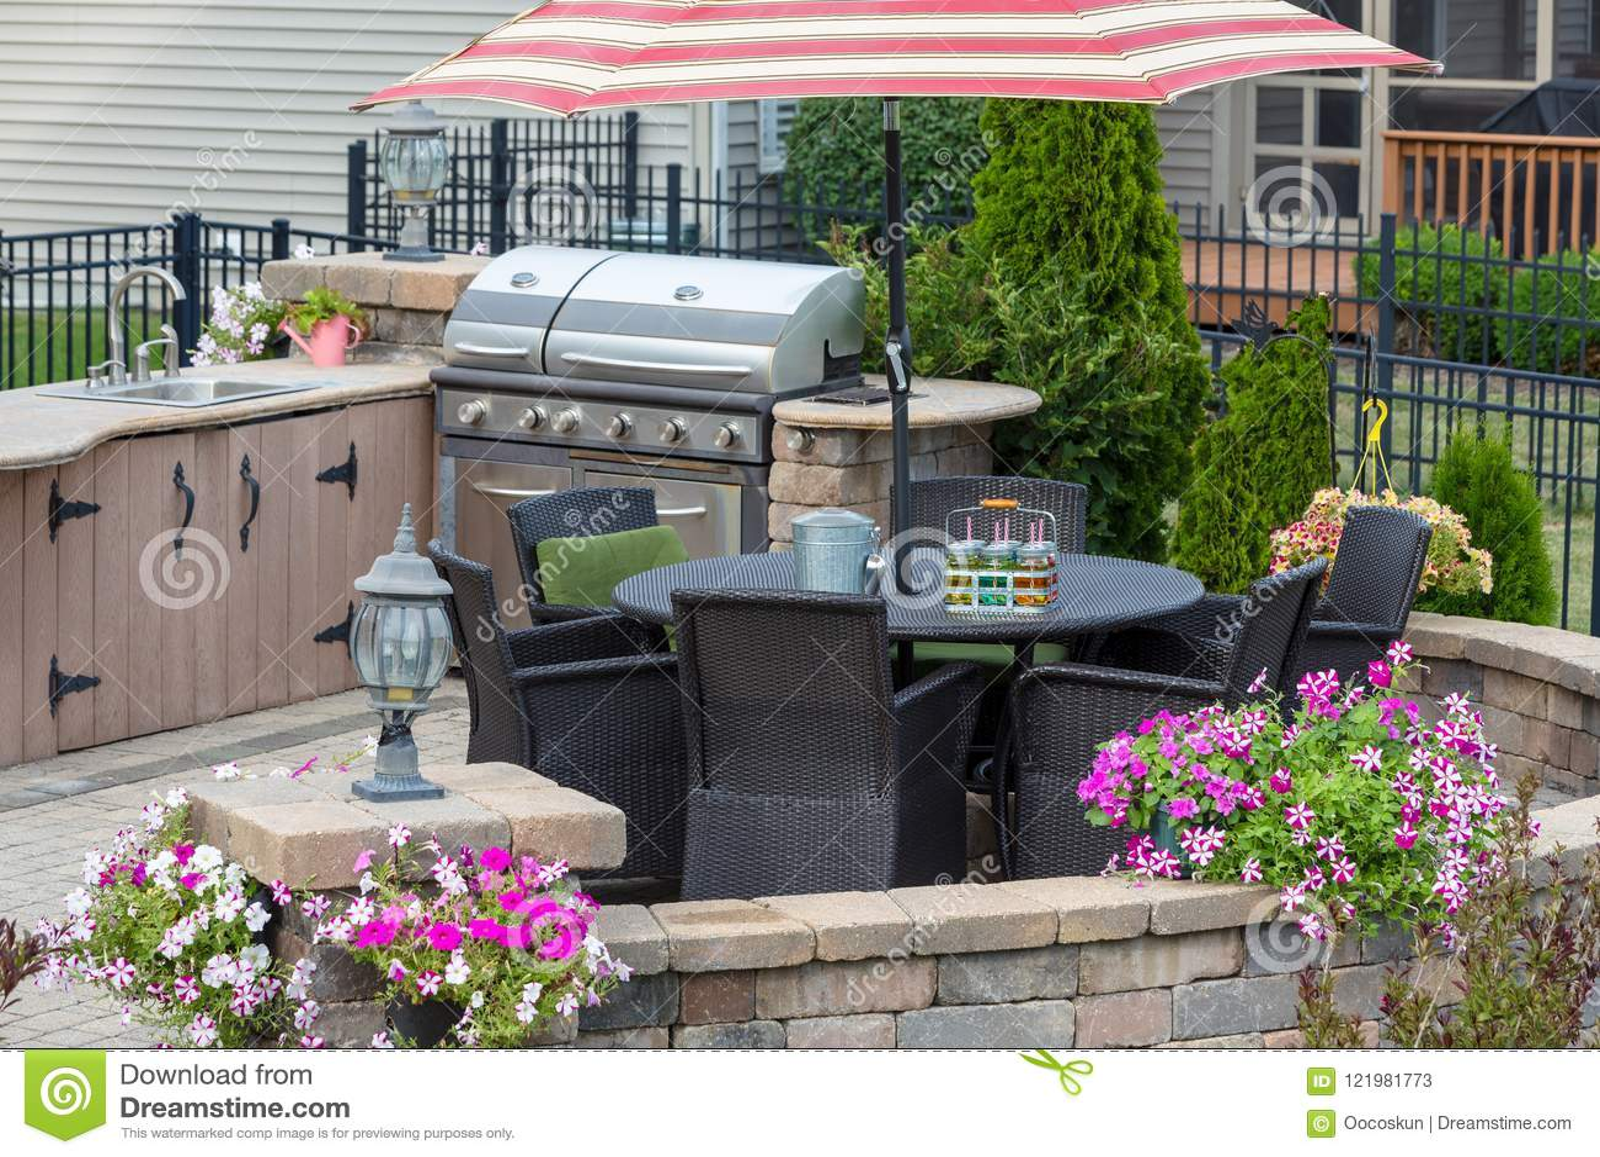 patio kitchen cheap flooring 砖外部露台的室外厨房库存图片 图片包括有柠檬水 具体 家具 庭院 一个砖外部露台的室外厨房有用餐椅子的柳条的在一个伞和五颜六色的夏天下在圆墙壁上开花